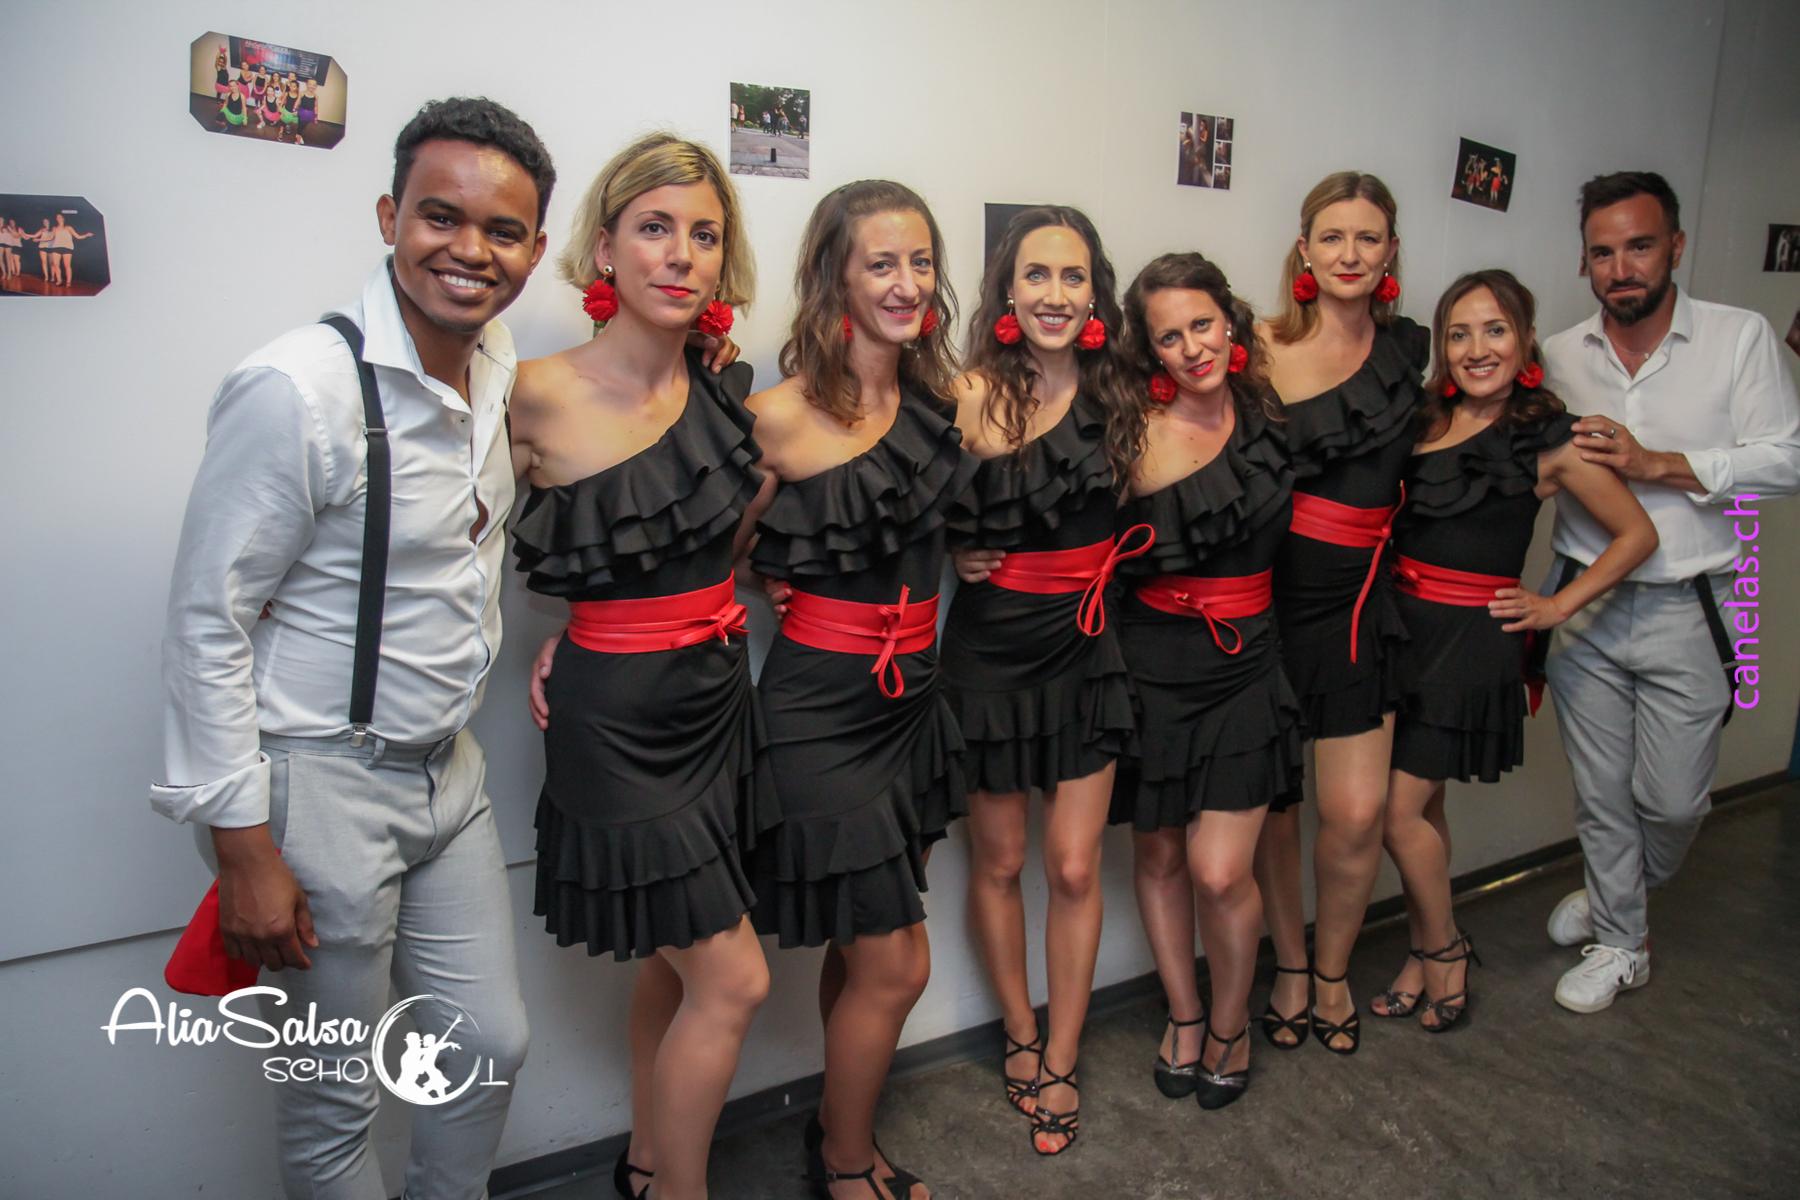 AliaSalsa ecole de danse lausanne soiree bachata salsa cubaineAlia Salsa Soireé Salsa - Bachata-10